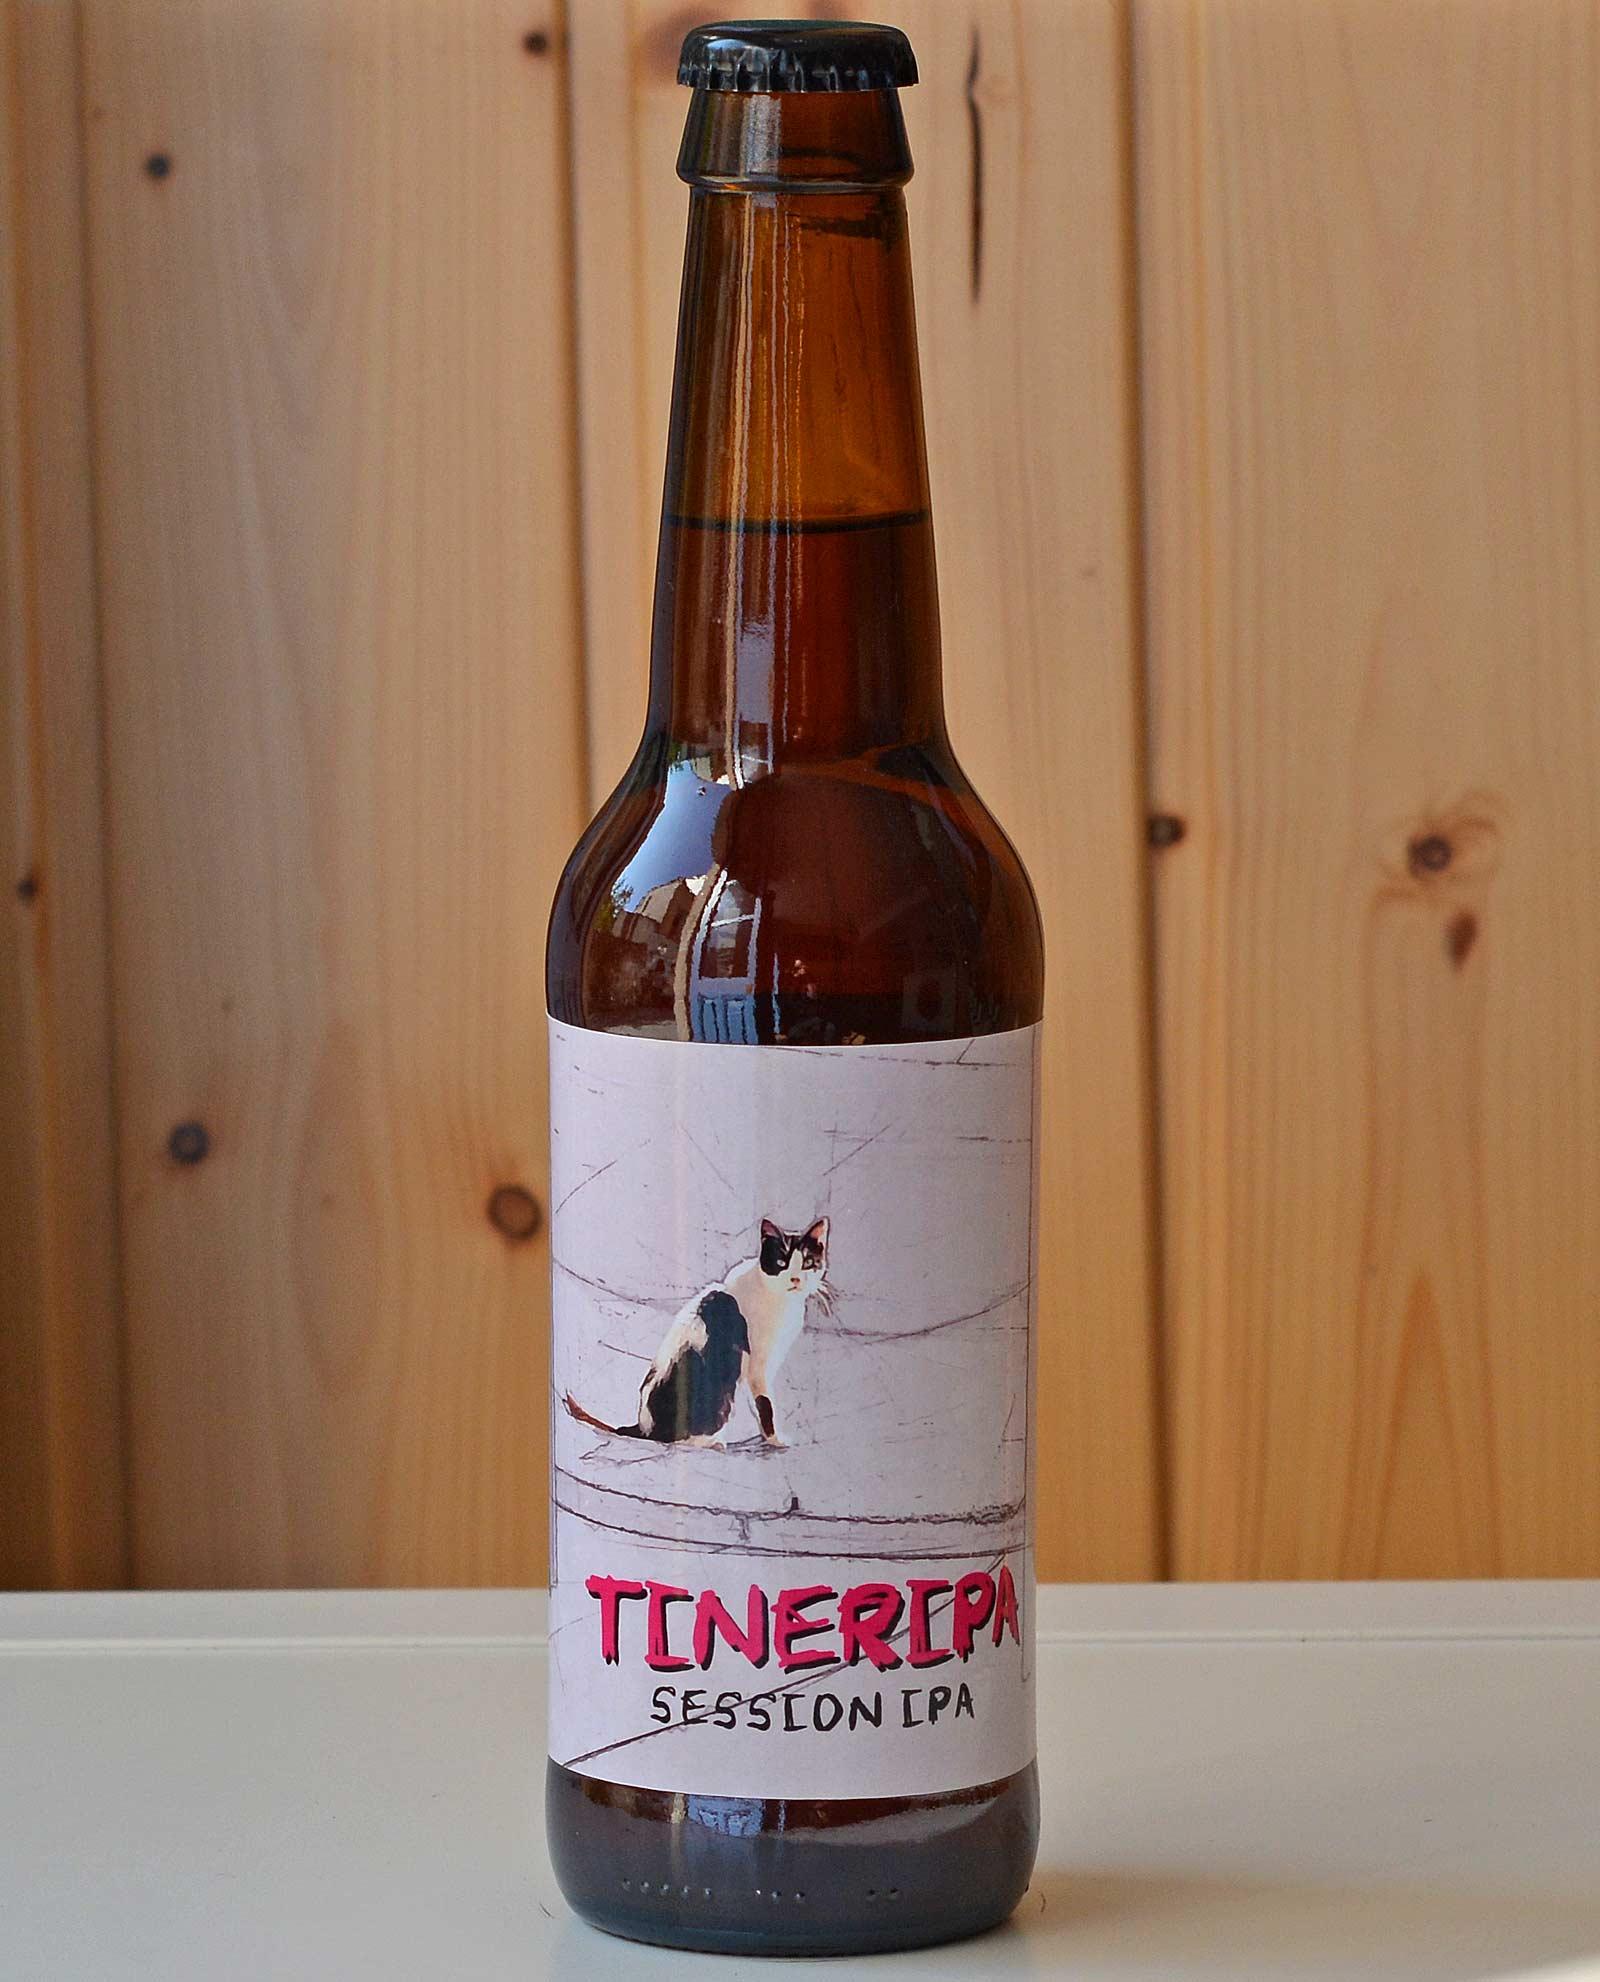 aloumina-cerveza-artesana-craft-beer-lugo-galicia-tineripa-sessionipa-001b